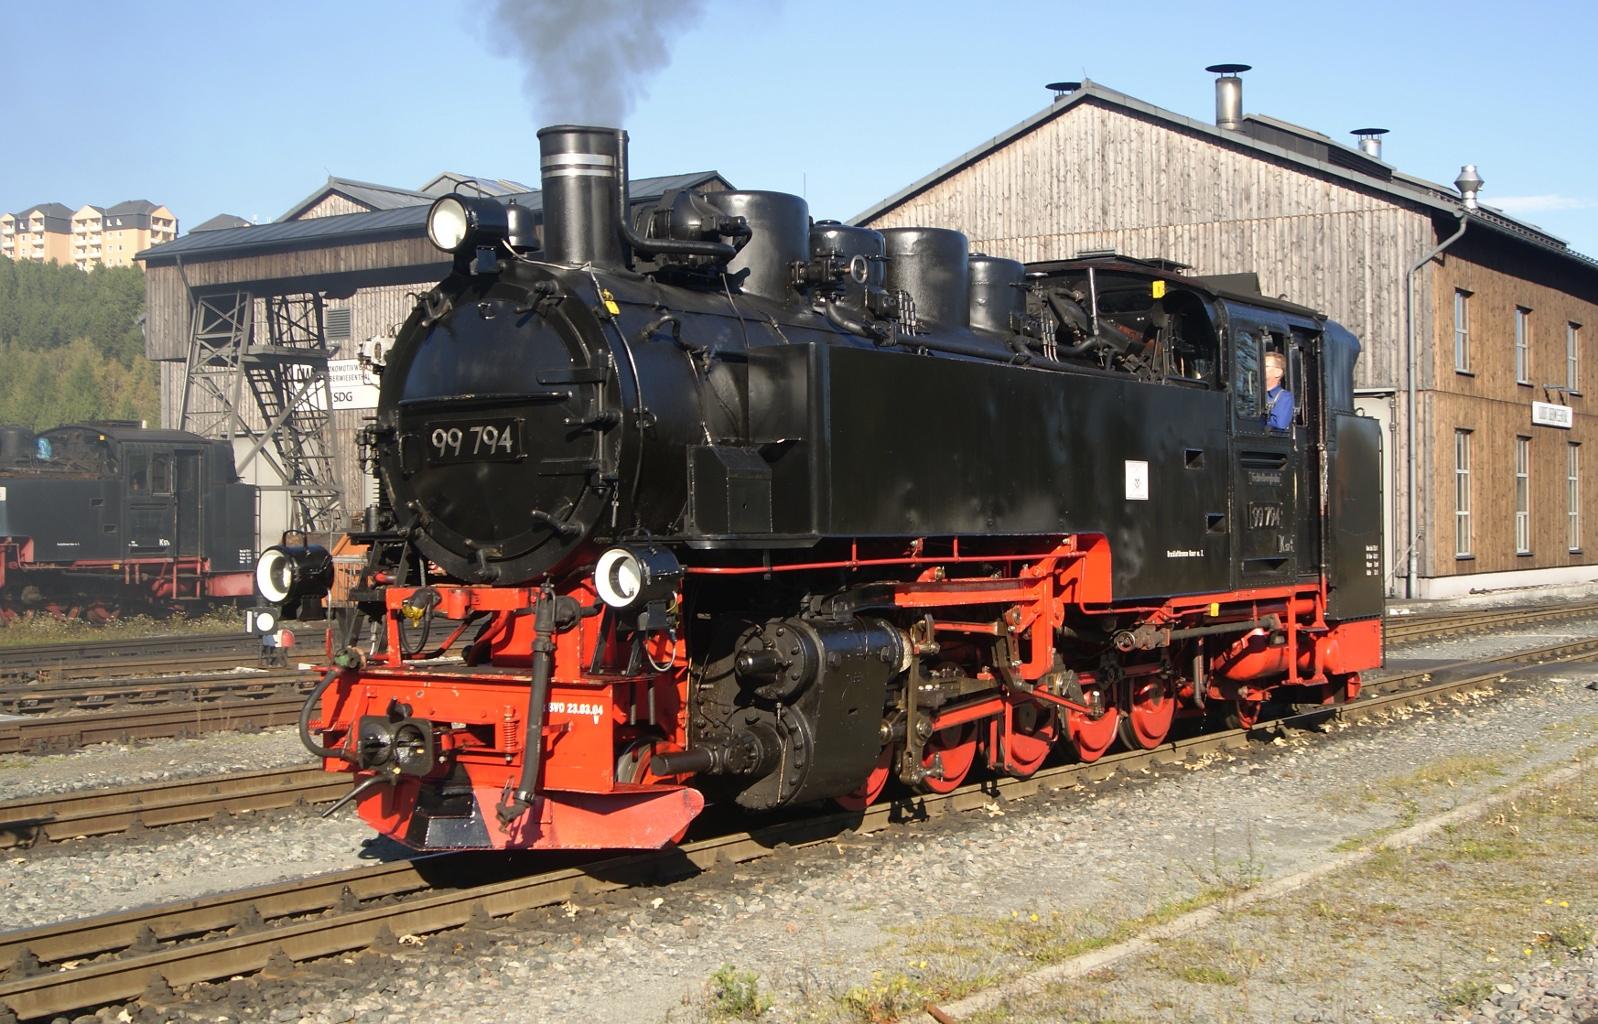 R-Baureihe 99.77-79